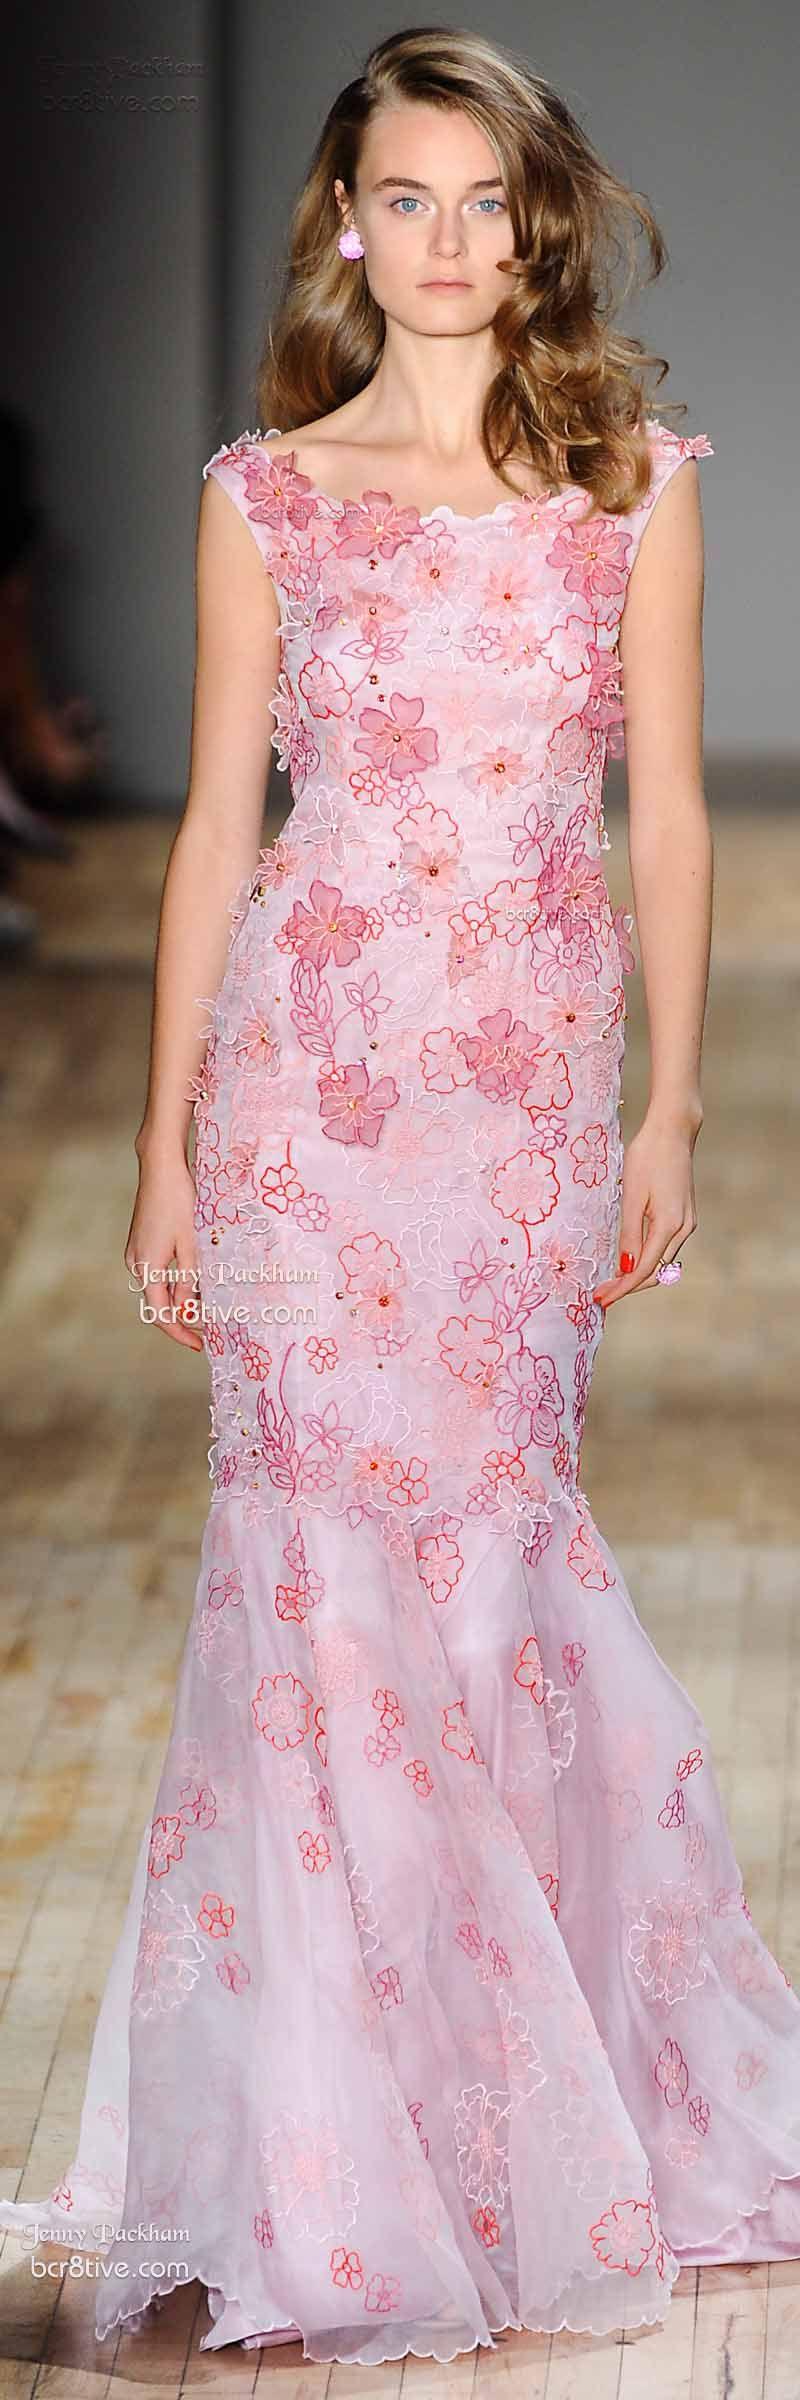 Jenny Packham Spring 2015 | Rosas, Blanco y Vestiditos